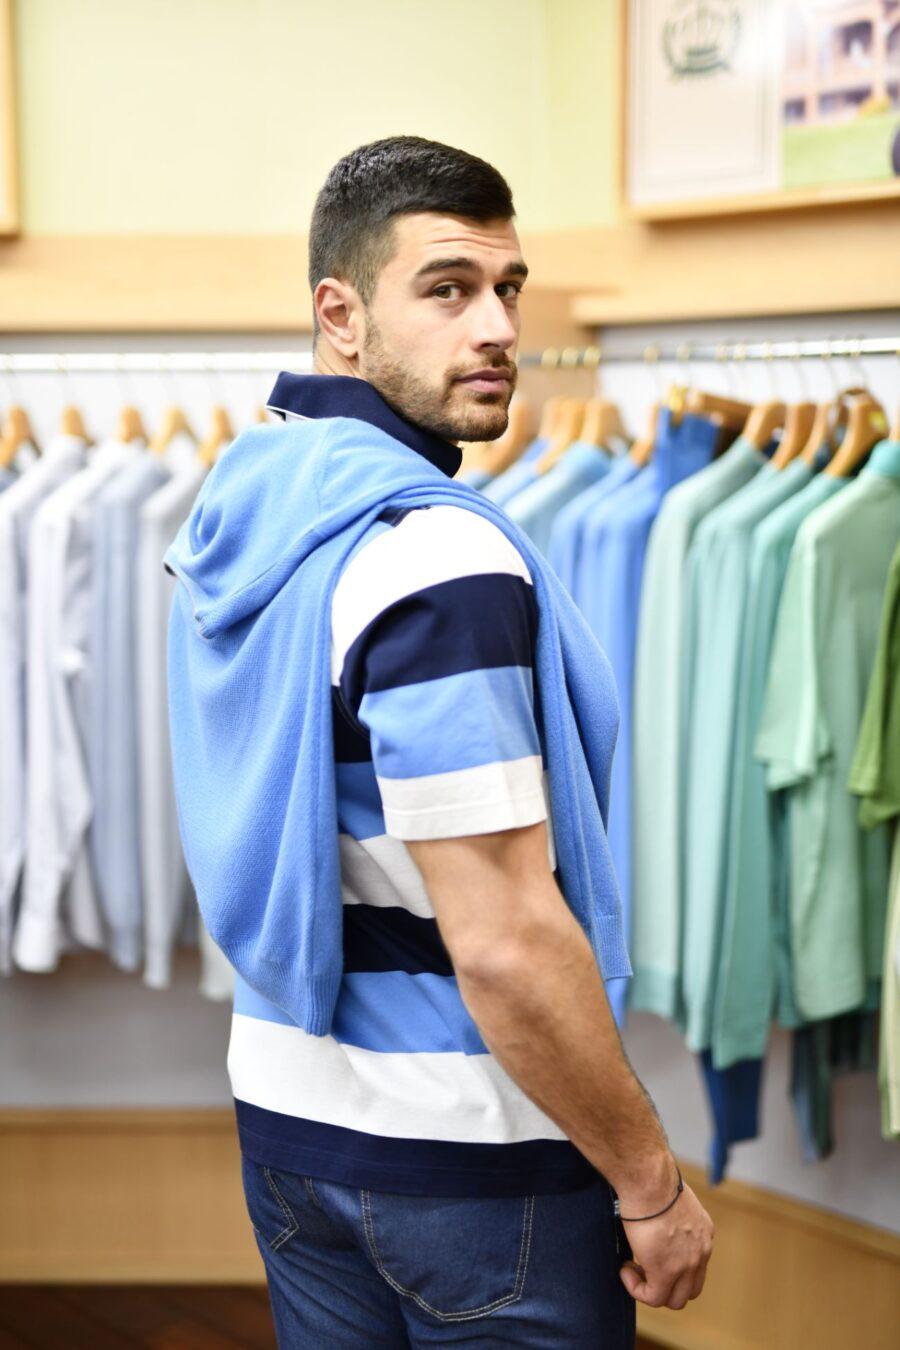 majki.puloveri.kashmir.instinct.store